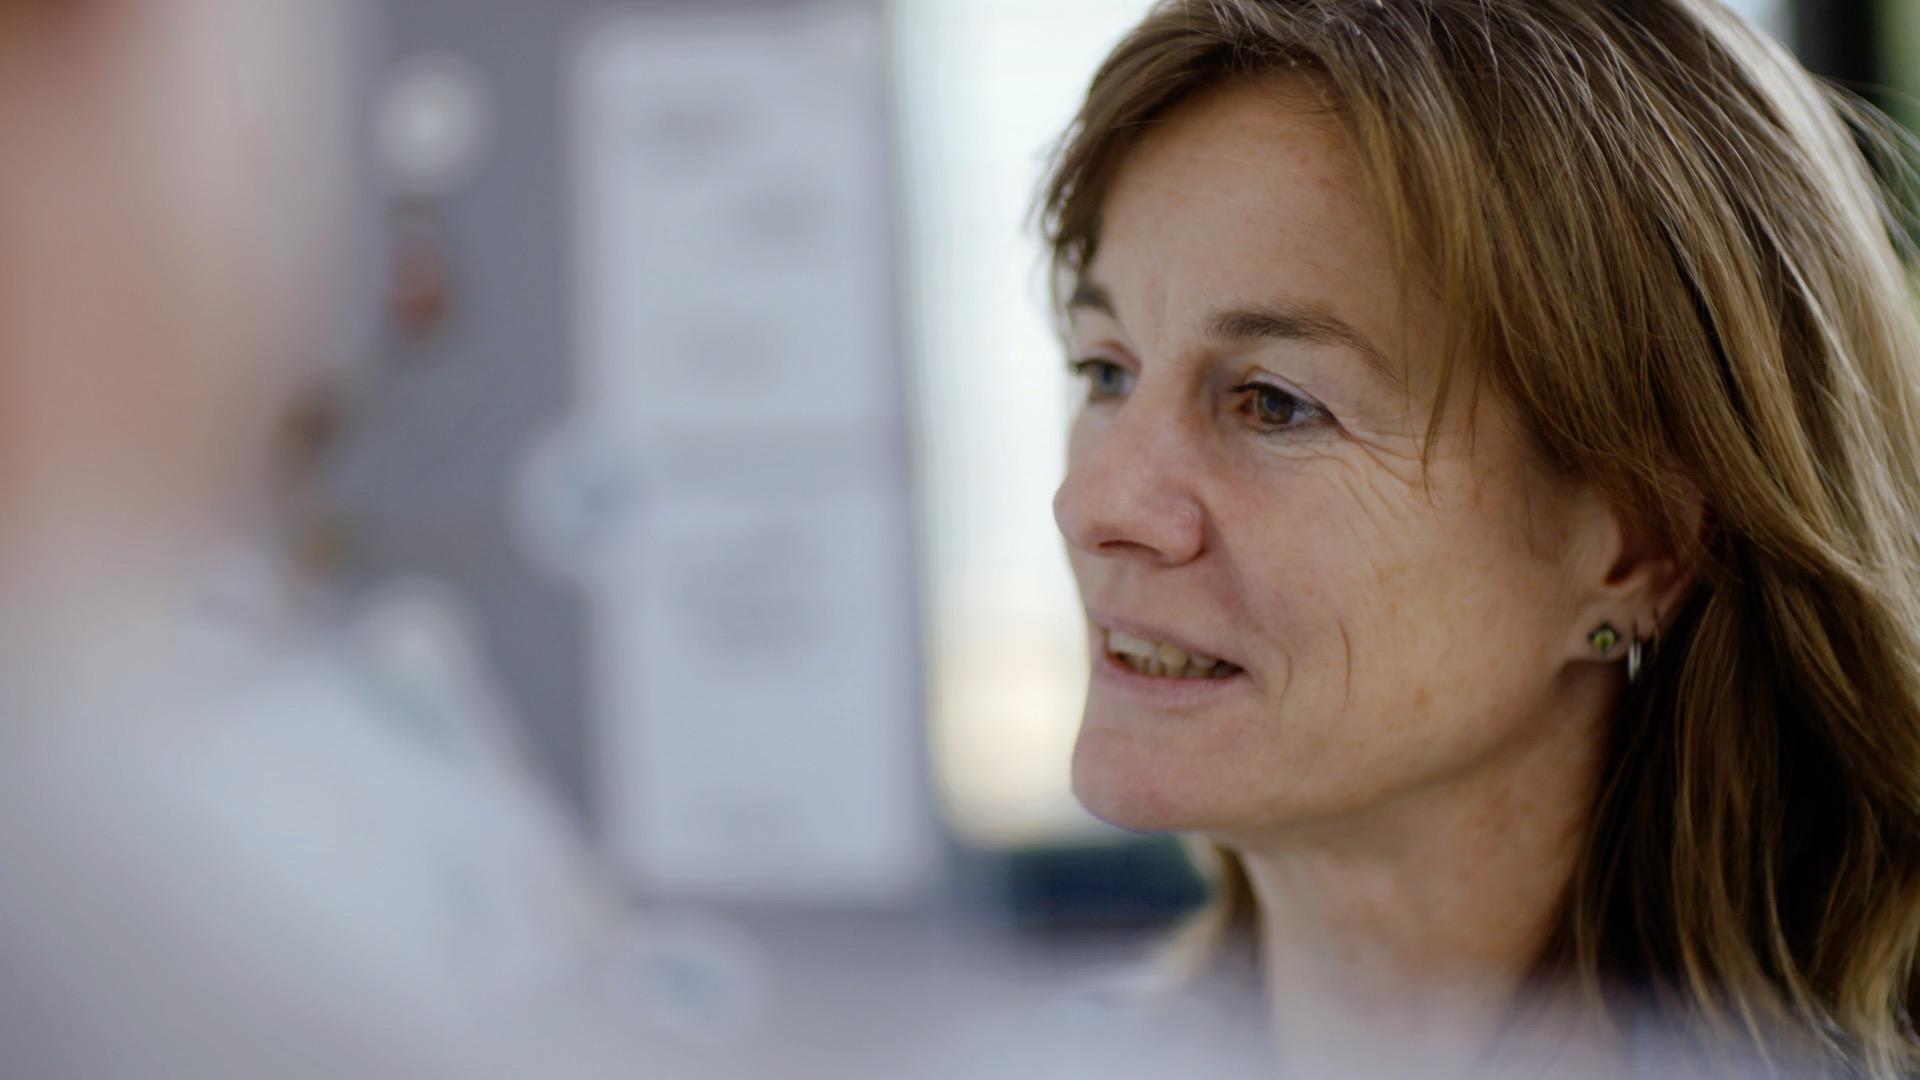 Klinisch psycholoog Mirjam